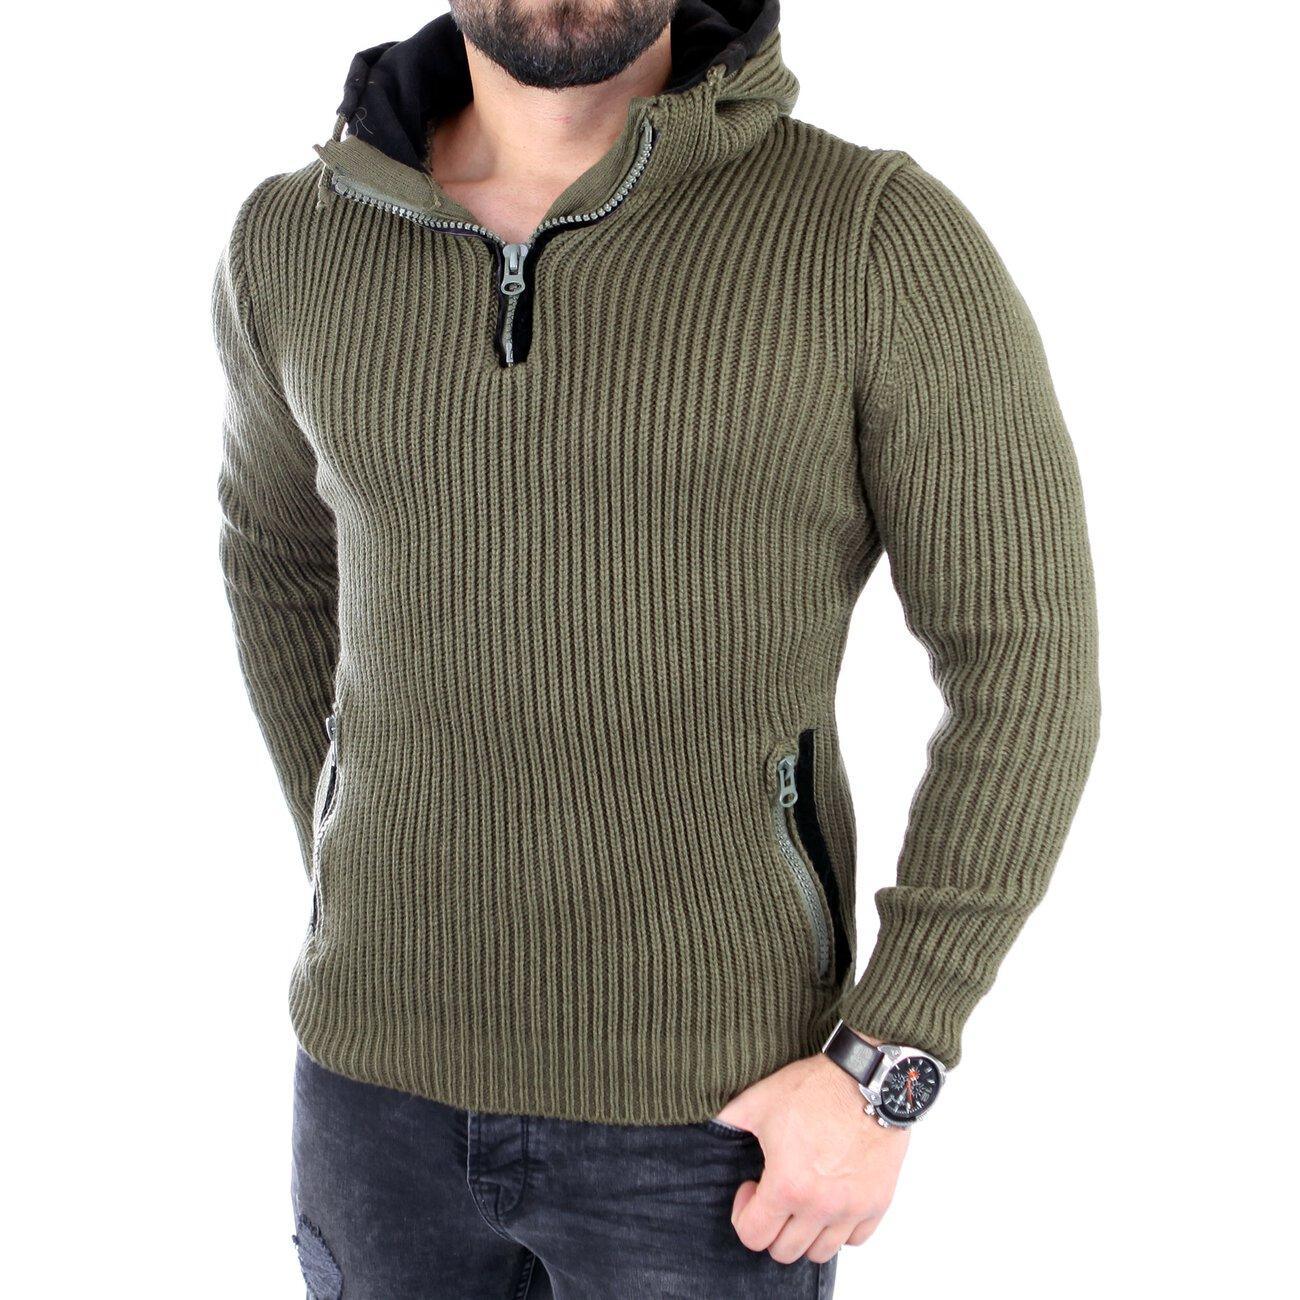 tazzio strickpullover herren winter kapuzen pullover hoodie tz 16492. Black Bedroom Furniture Sets. Home Design Ideas